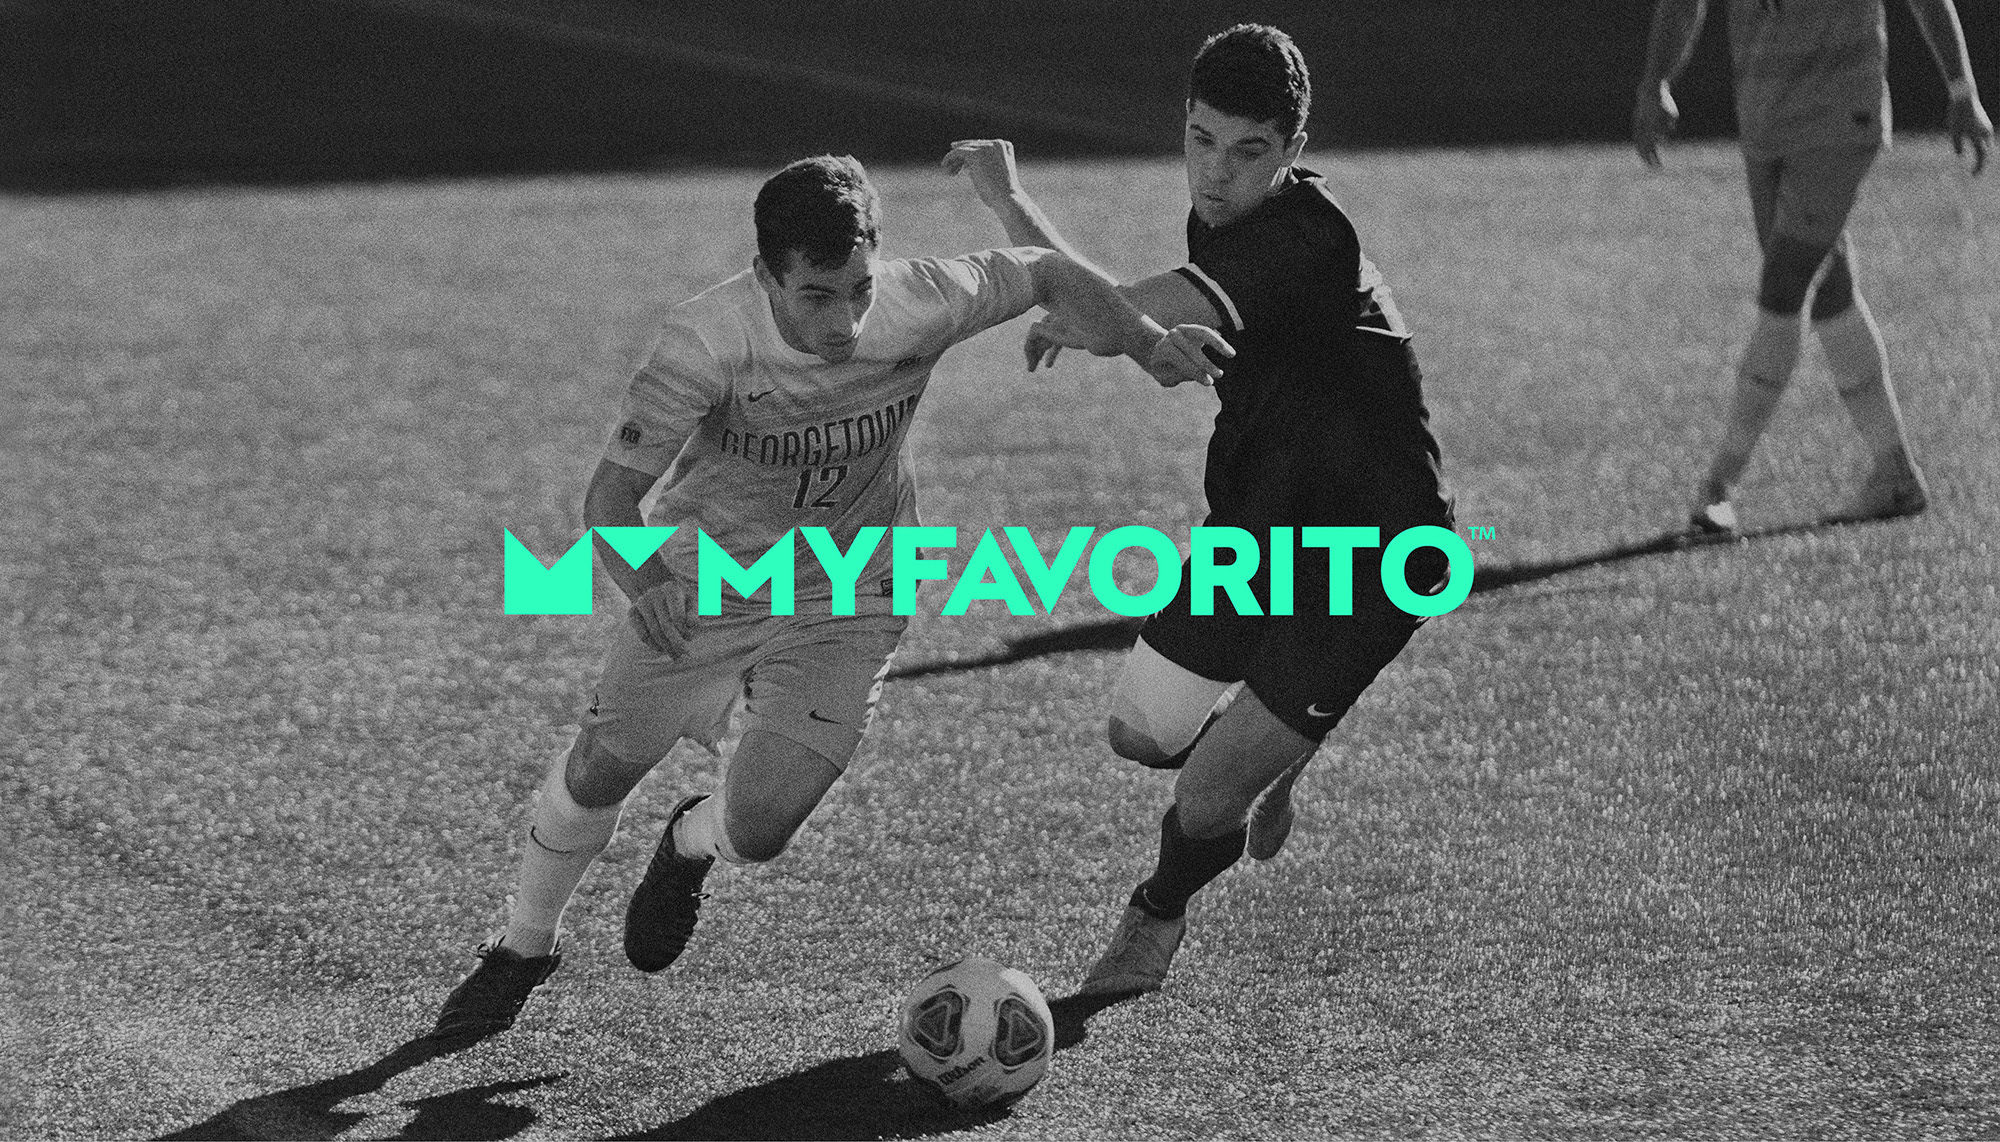 MyFavorito